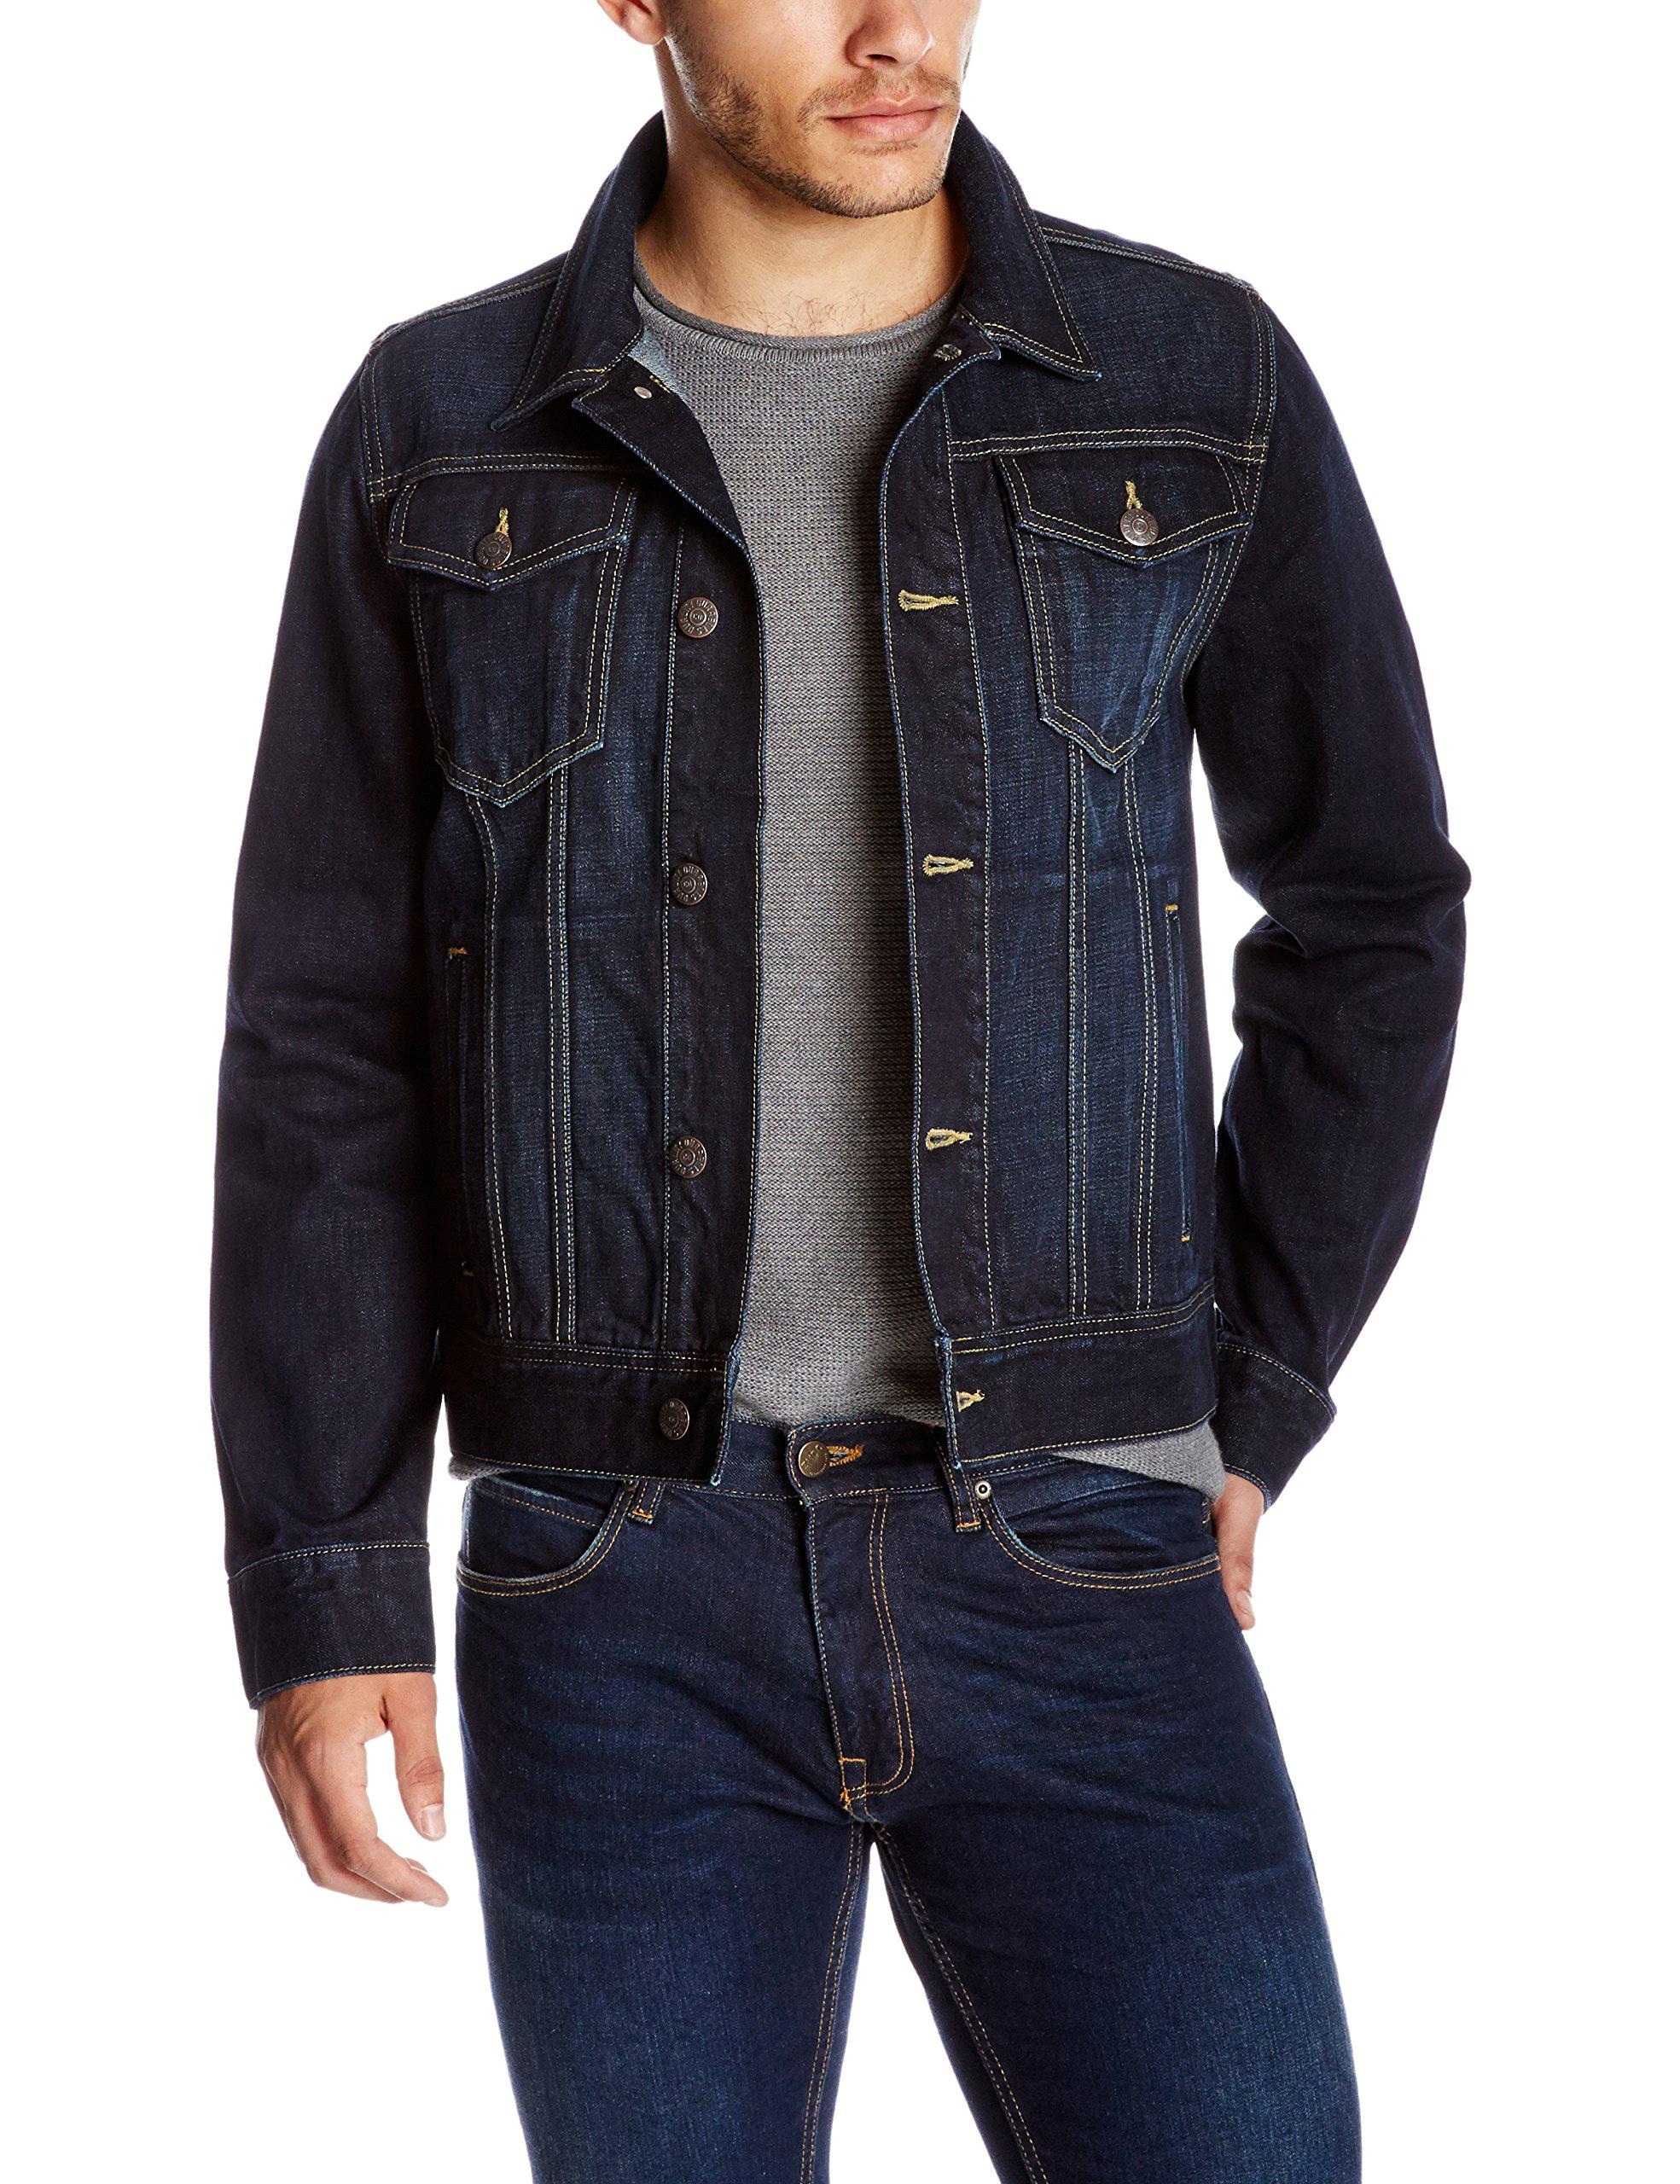 Quality Durables Co. Men's Regular Fit Jean Jacket M Rinsed Wash